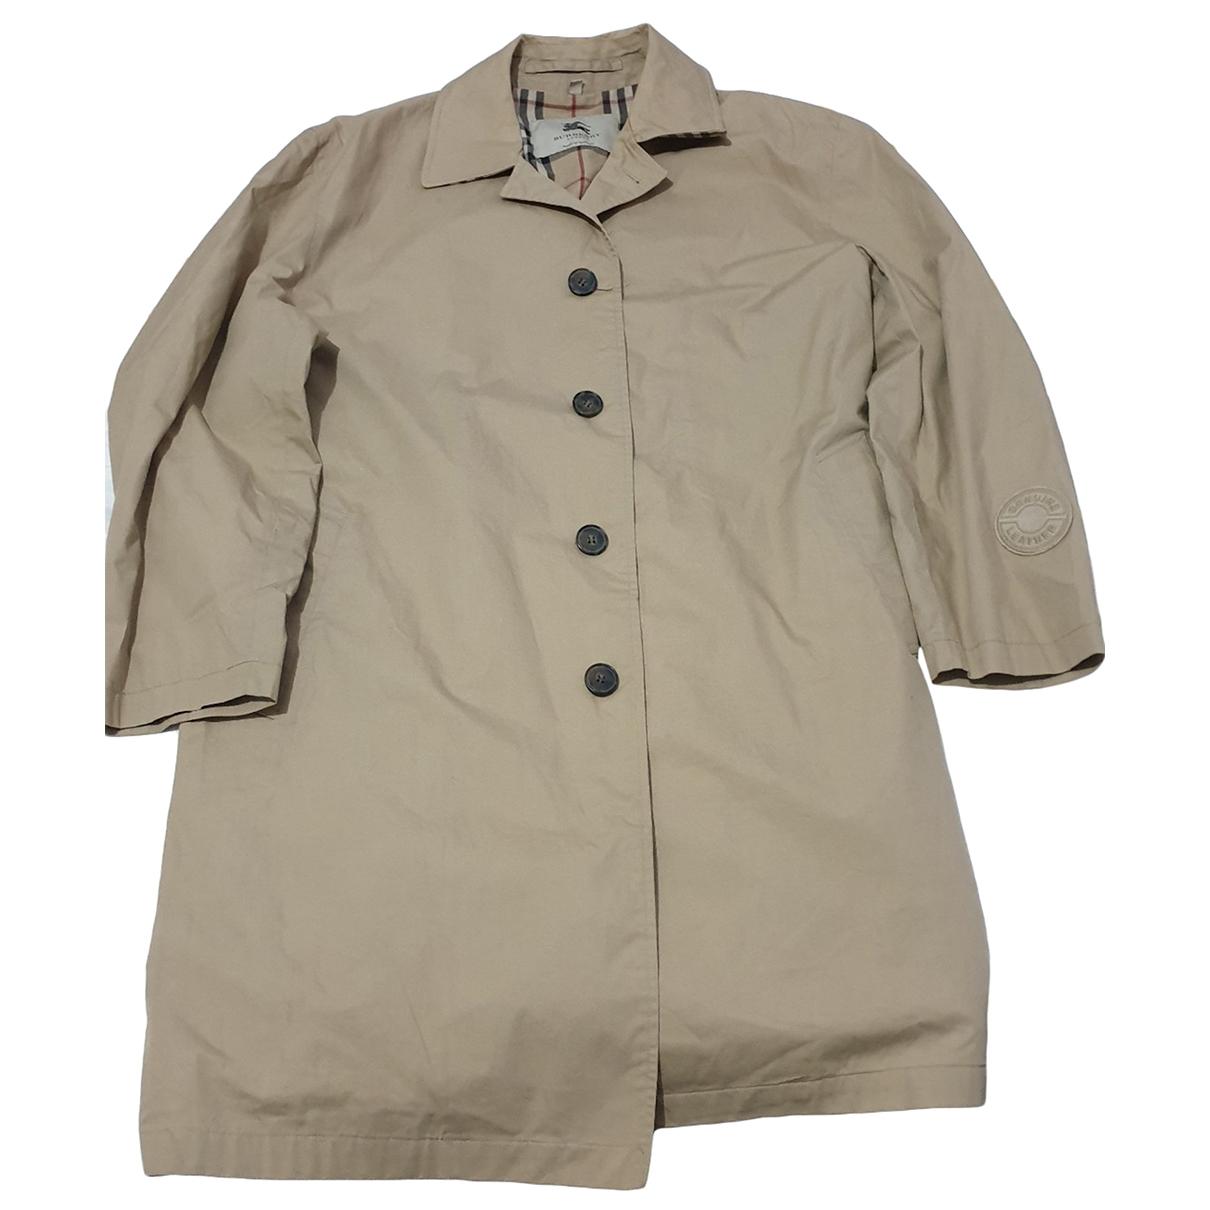 Burberry \N Beige Cotton coat  for Men L International